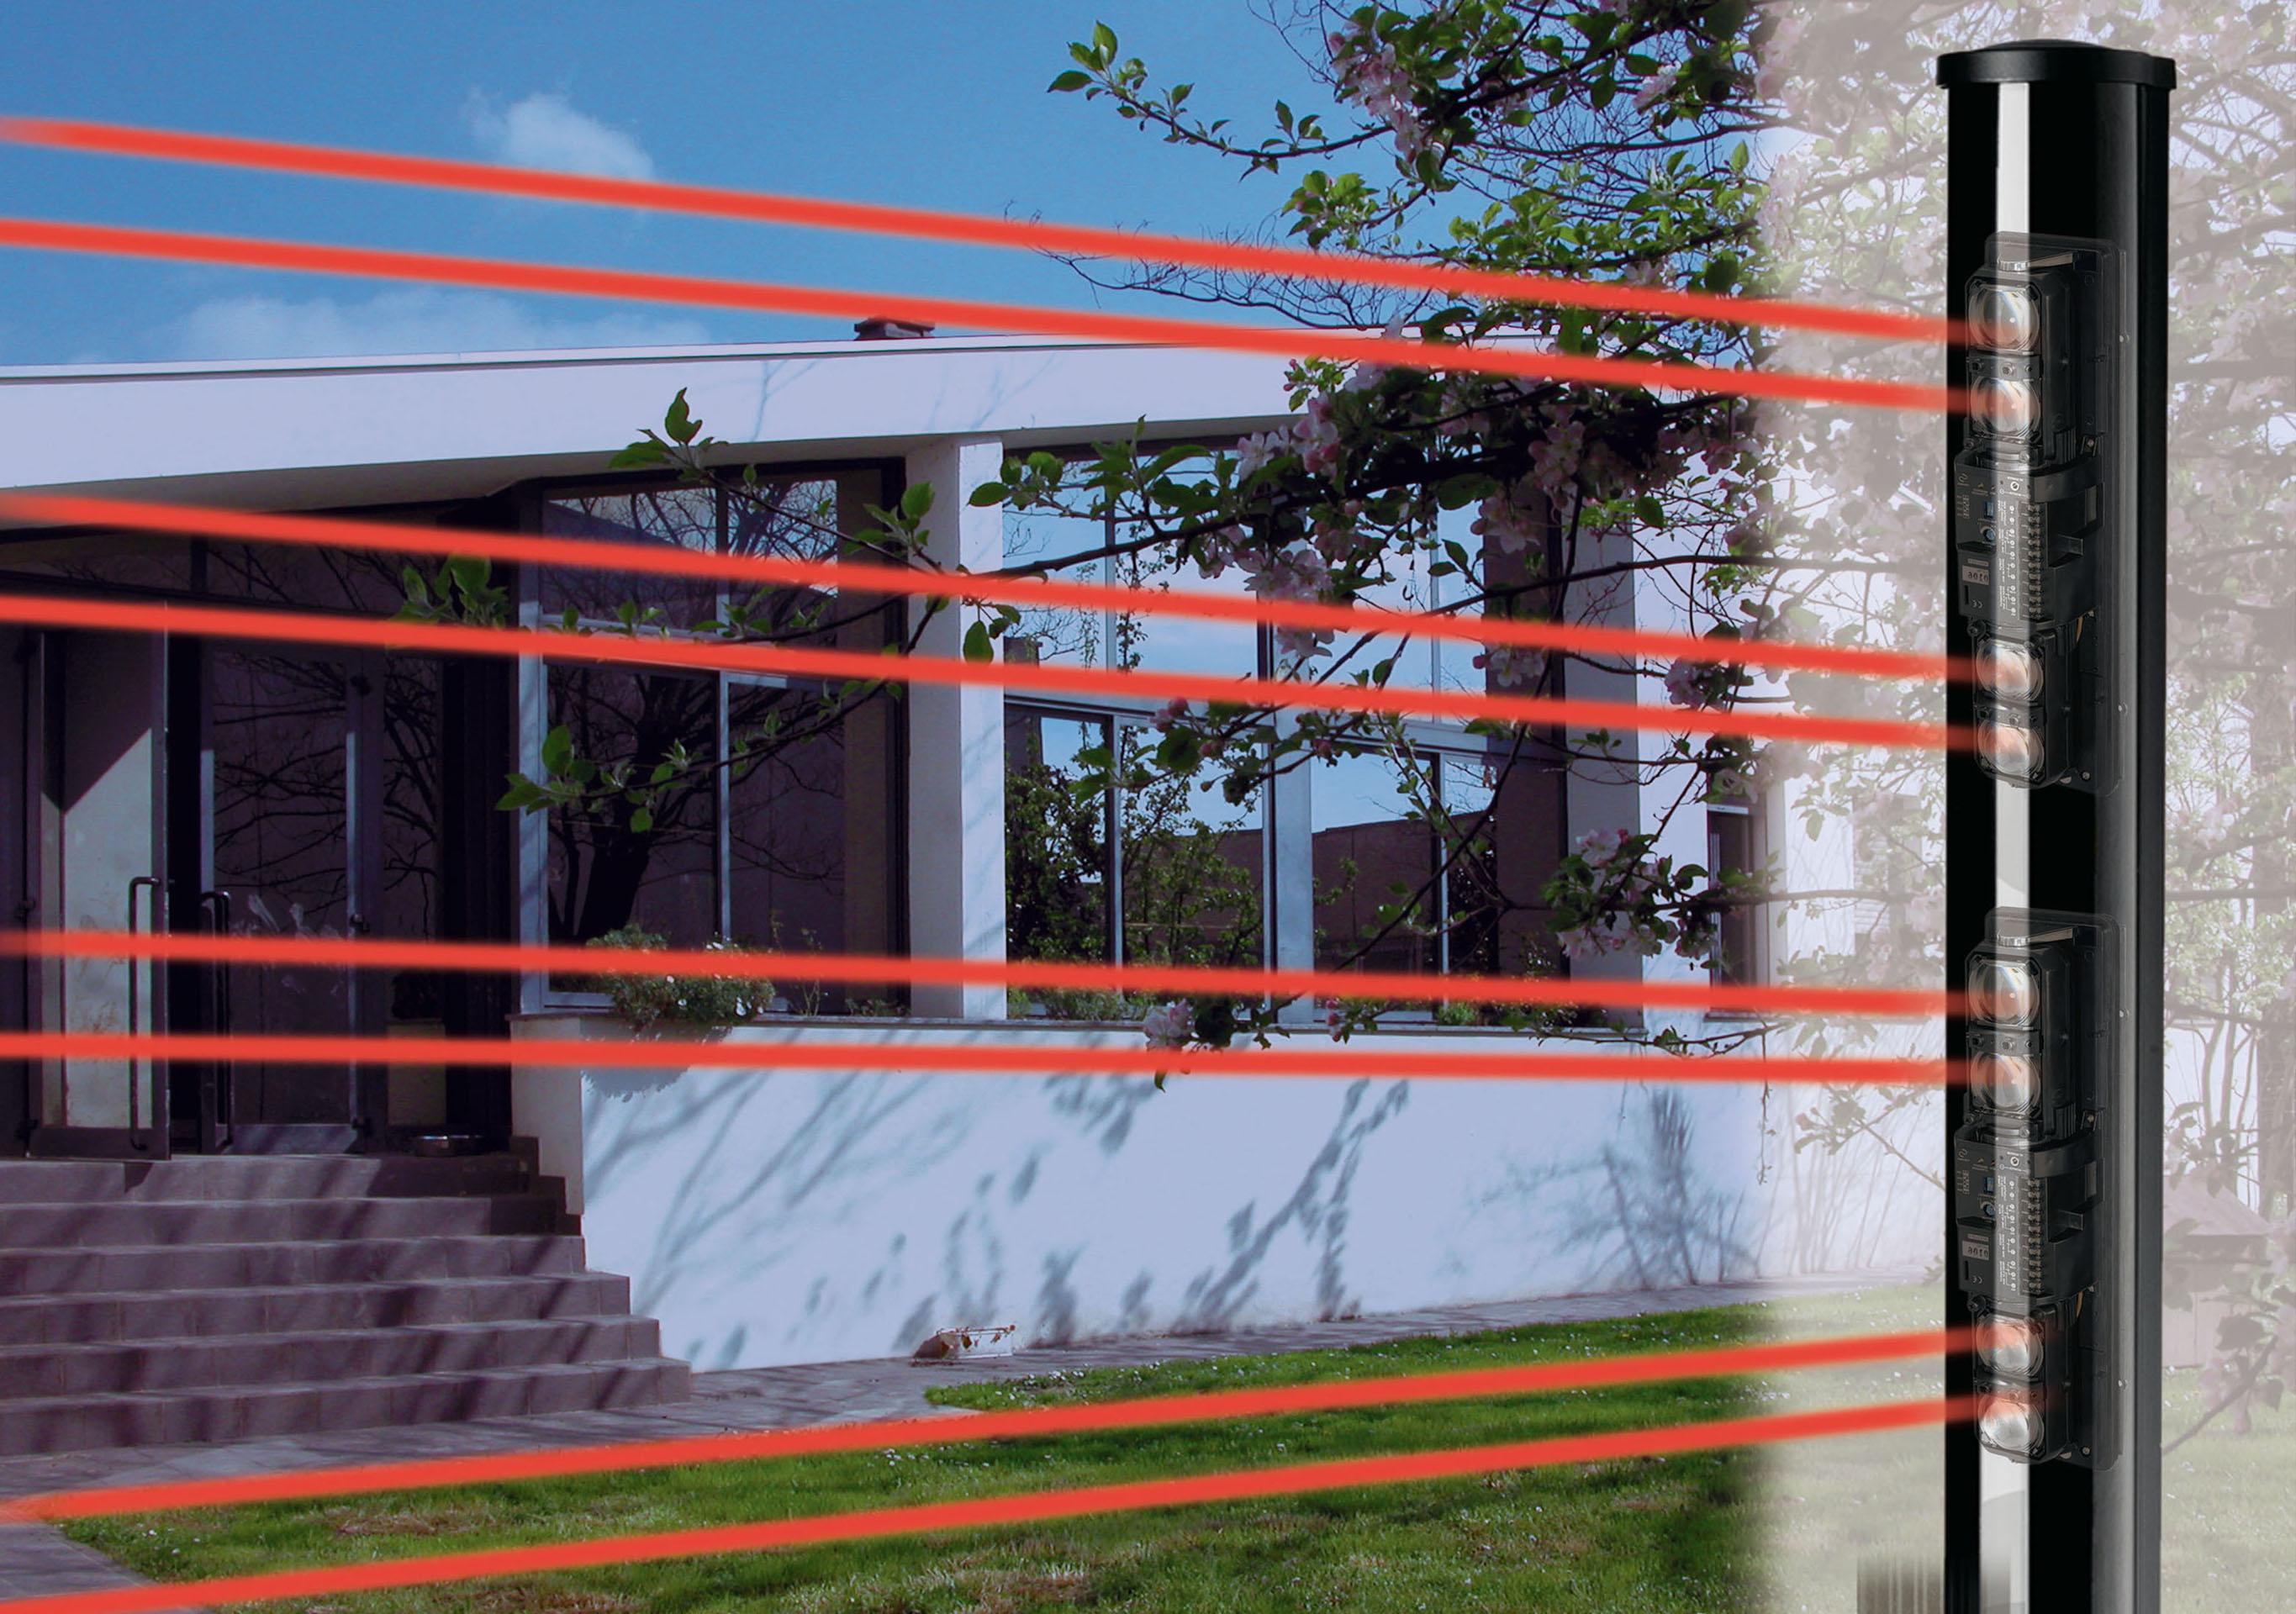 Antifurti dm elettronica srl - Barriere infrarossi per finestre ...